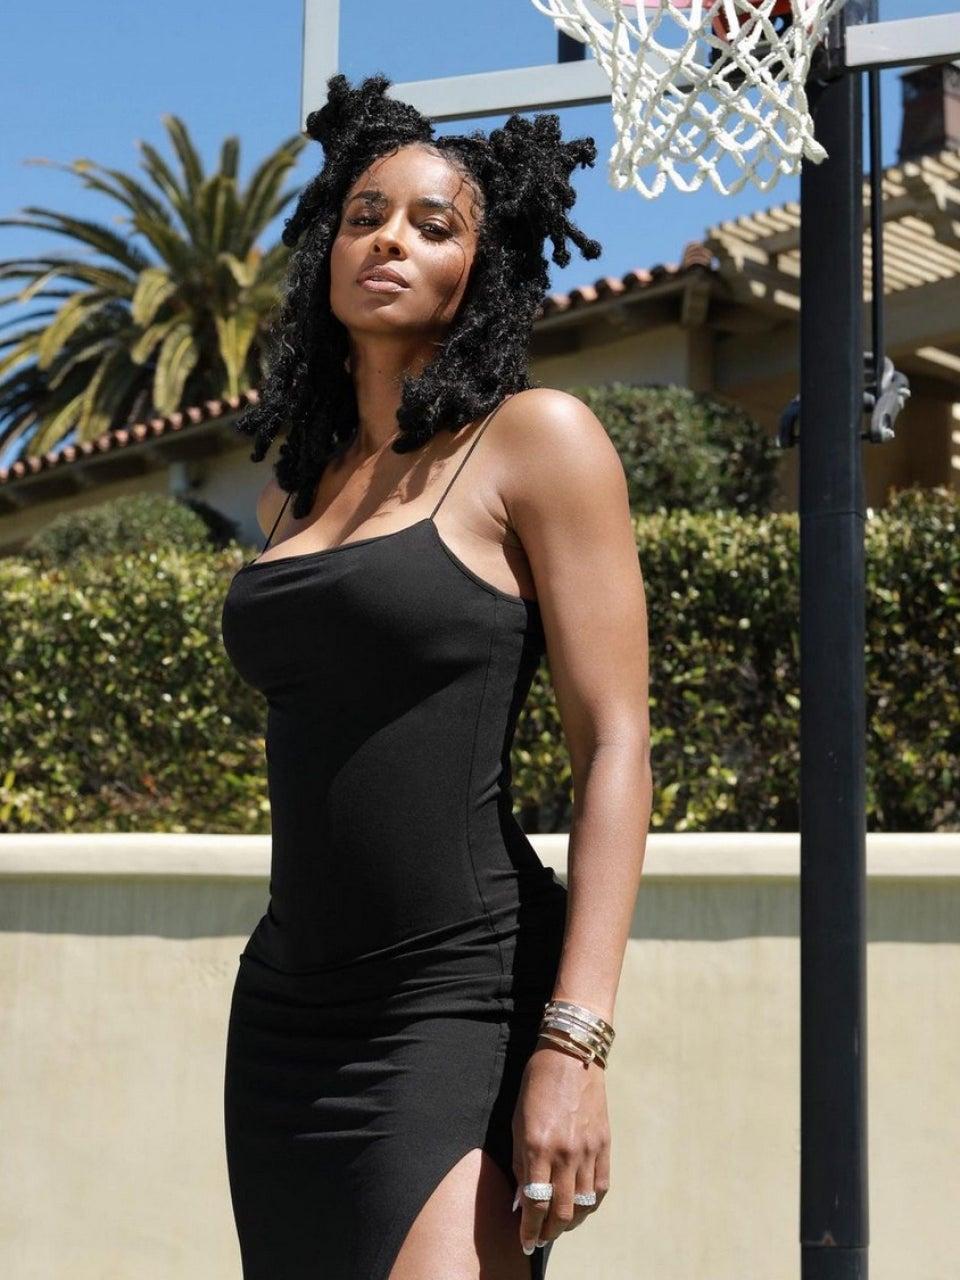 Star Gazing: Ciara, Toni Braxton, Normani, Meagan Good & More Usher In Spring Serving Face & BAWDY